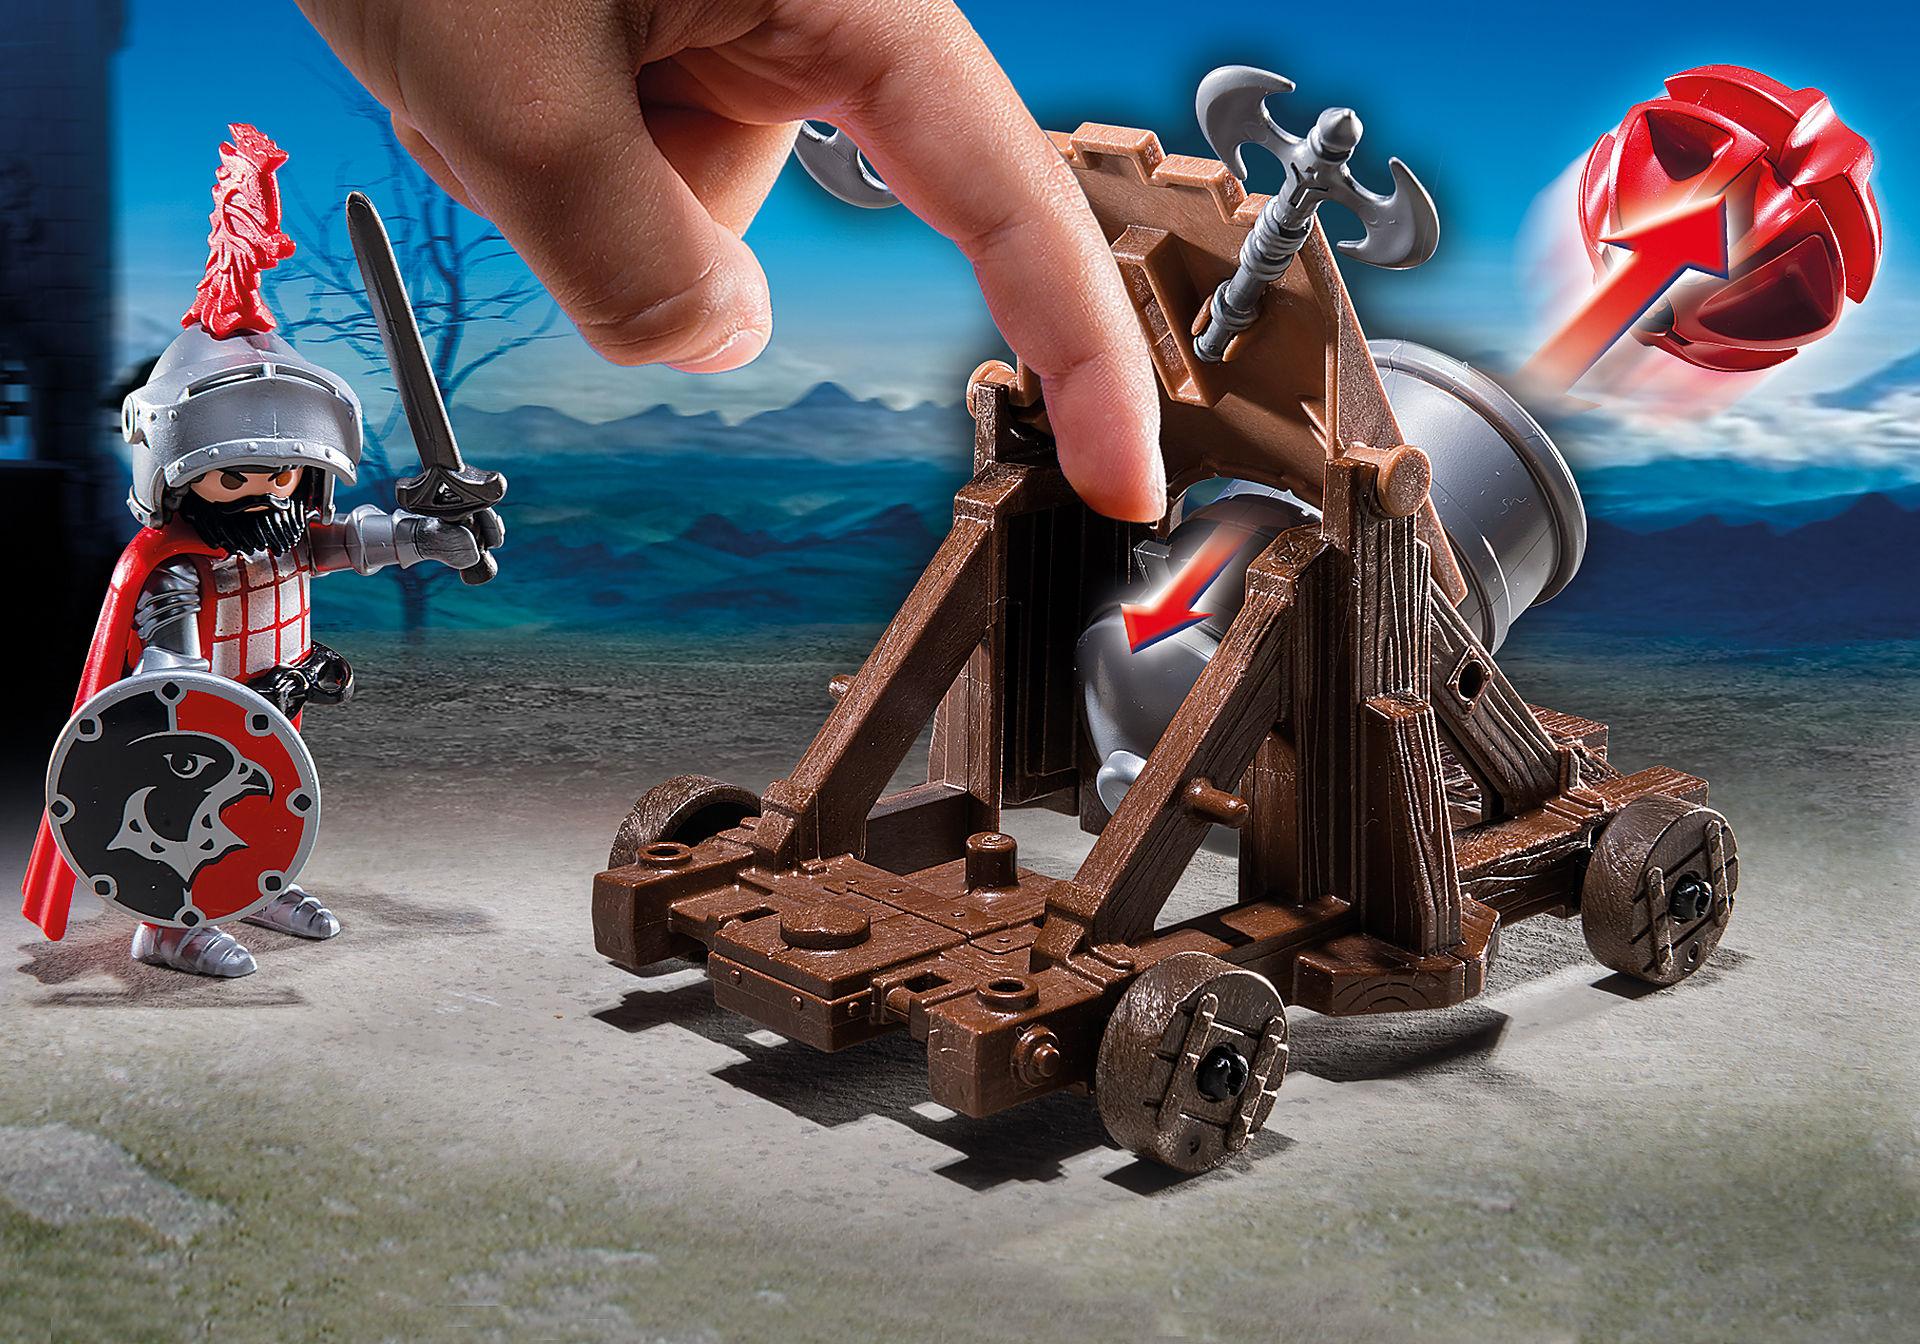 http://media.playmobil.com/i/playmobil/6038_product_extra2/Chevaliers de l`Aigle avec canon géant